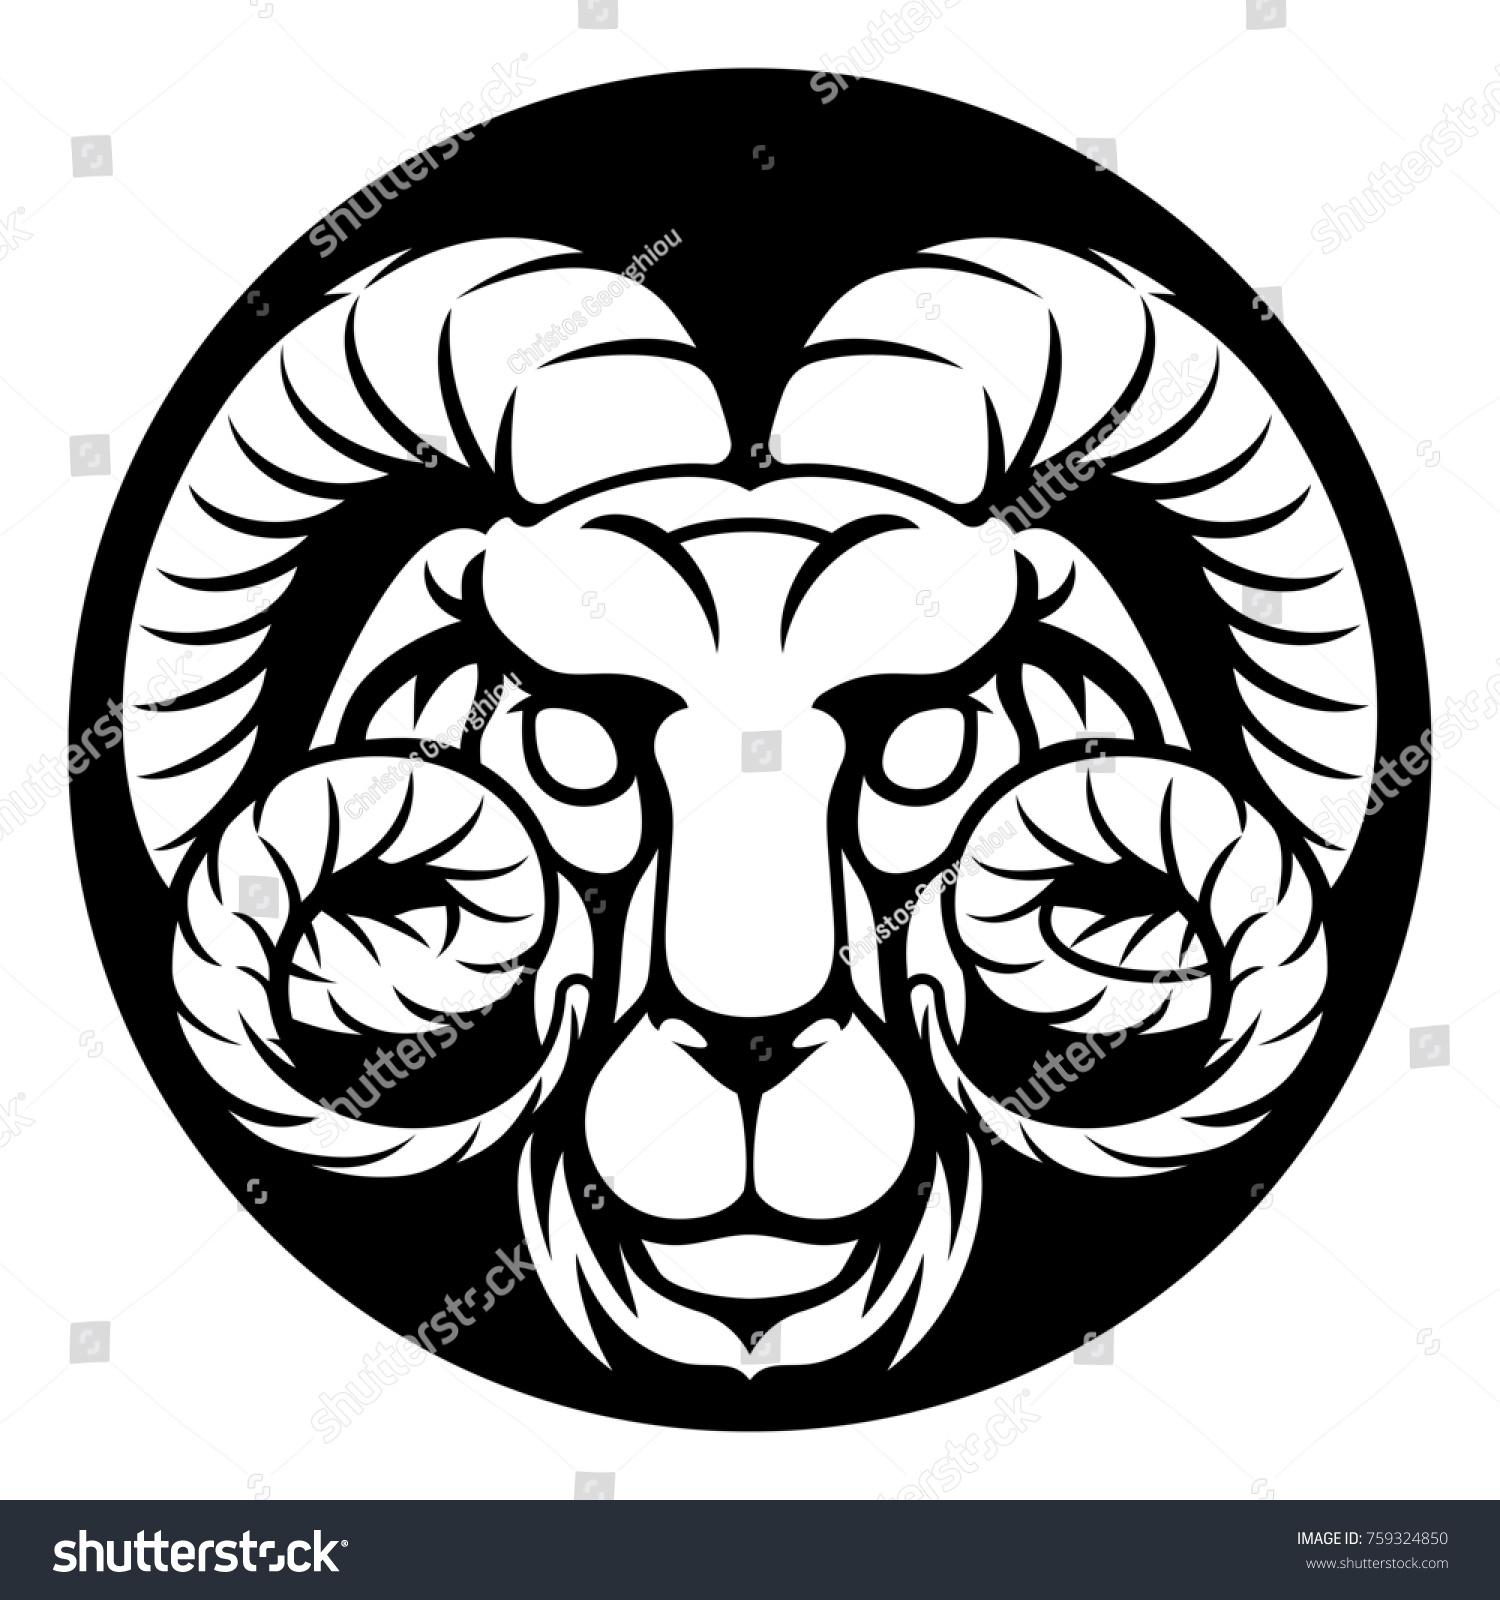 6ee7f360d Cirlce Aries Ram Symbol Astrology Horoscope Stock Illustration ...